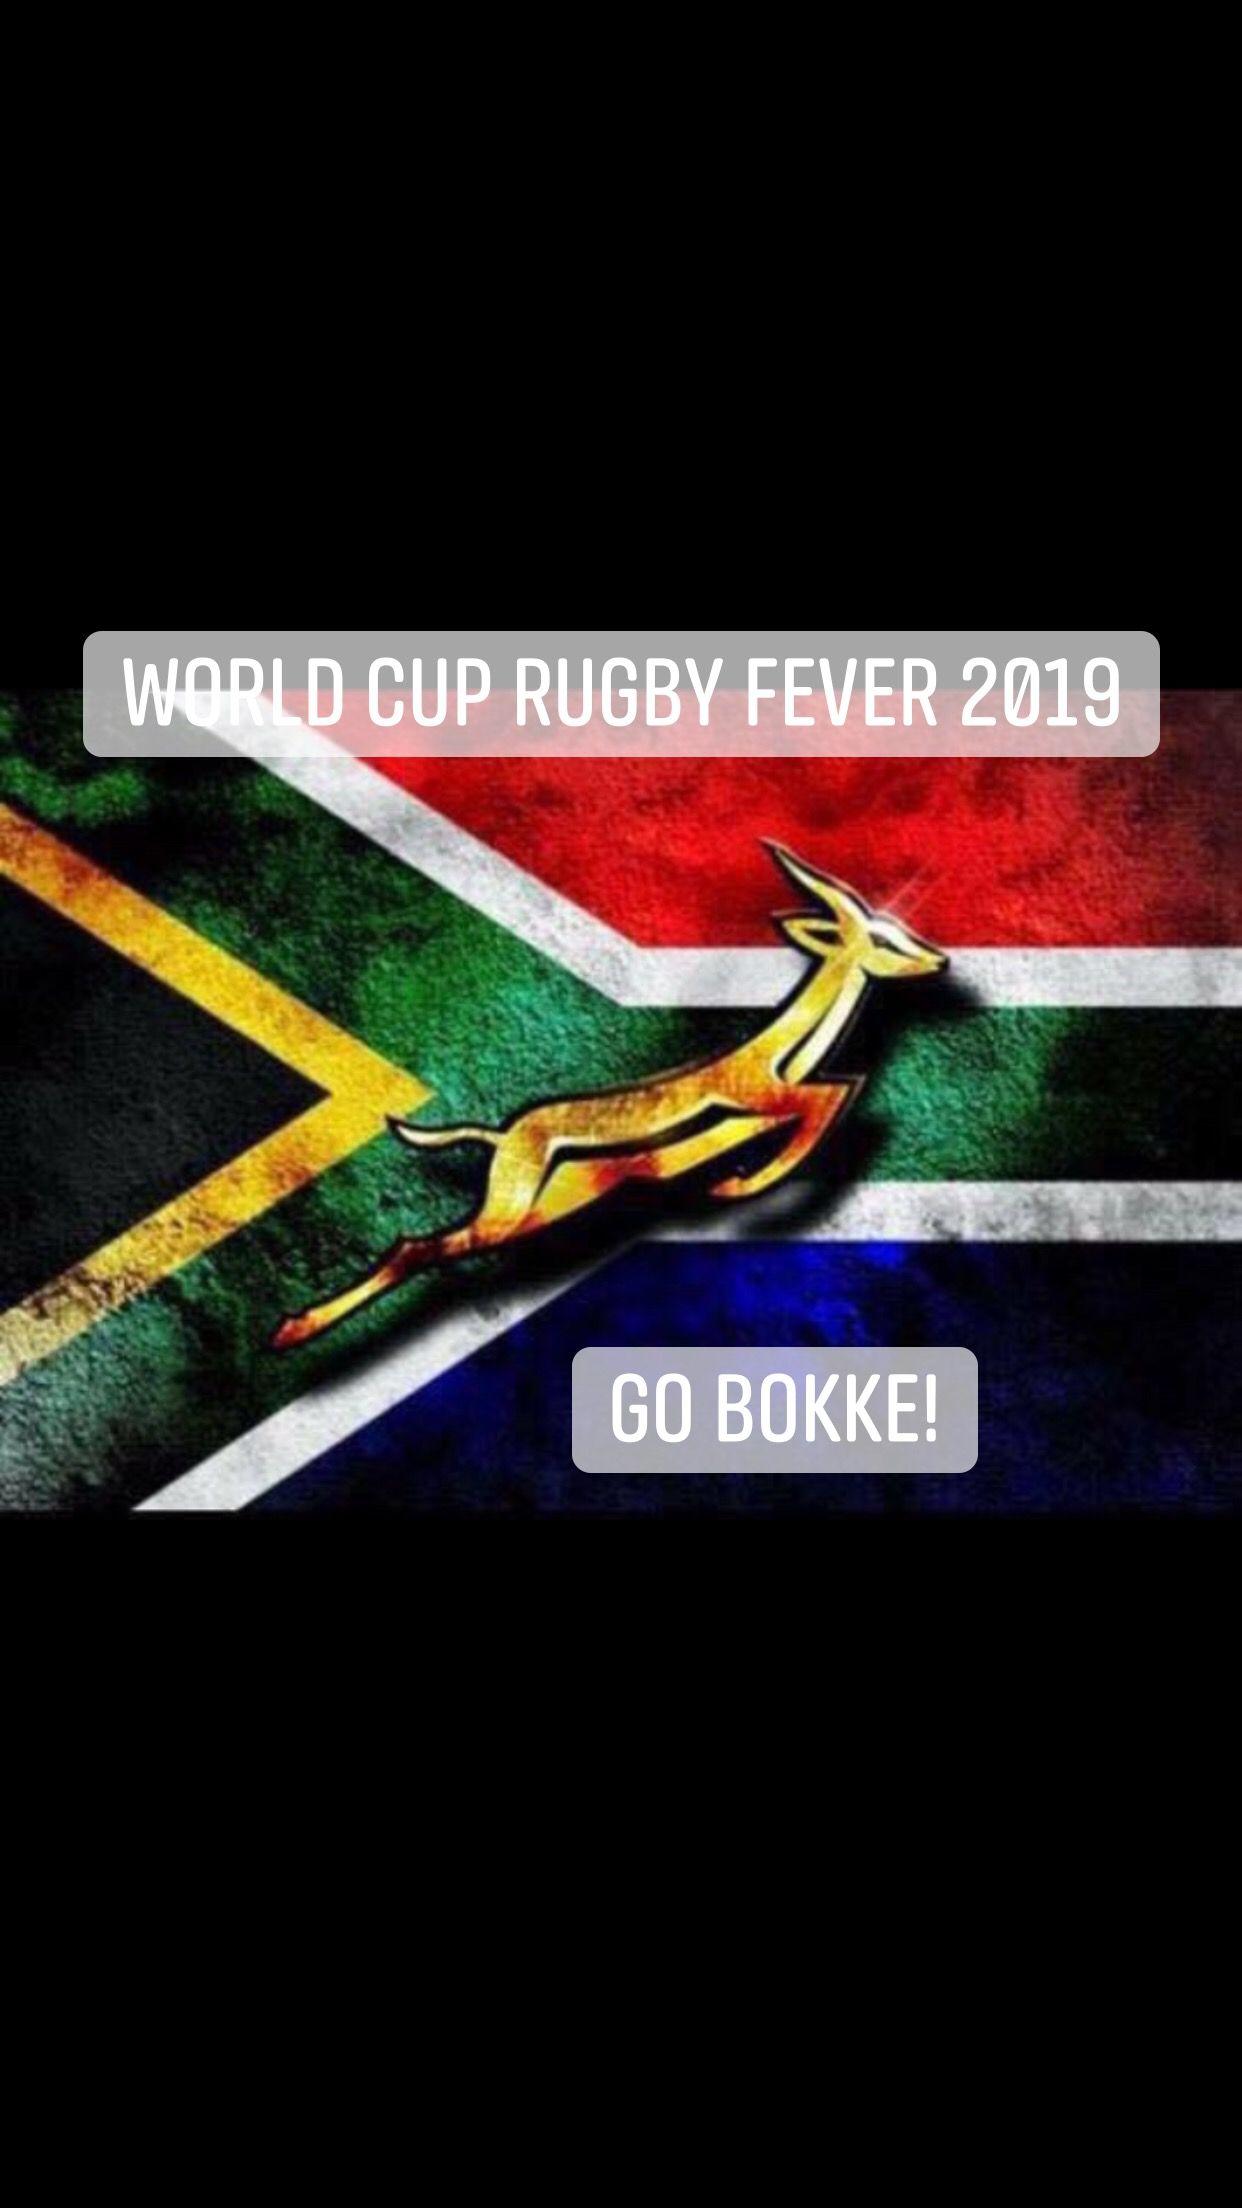 Go Bokke Go Bokke Springbok Rugby Rugby